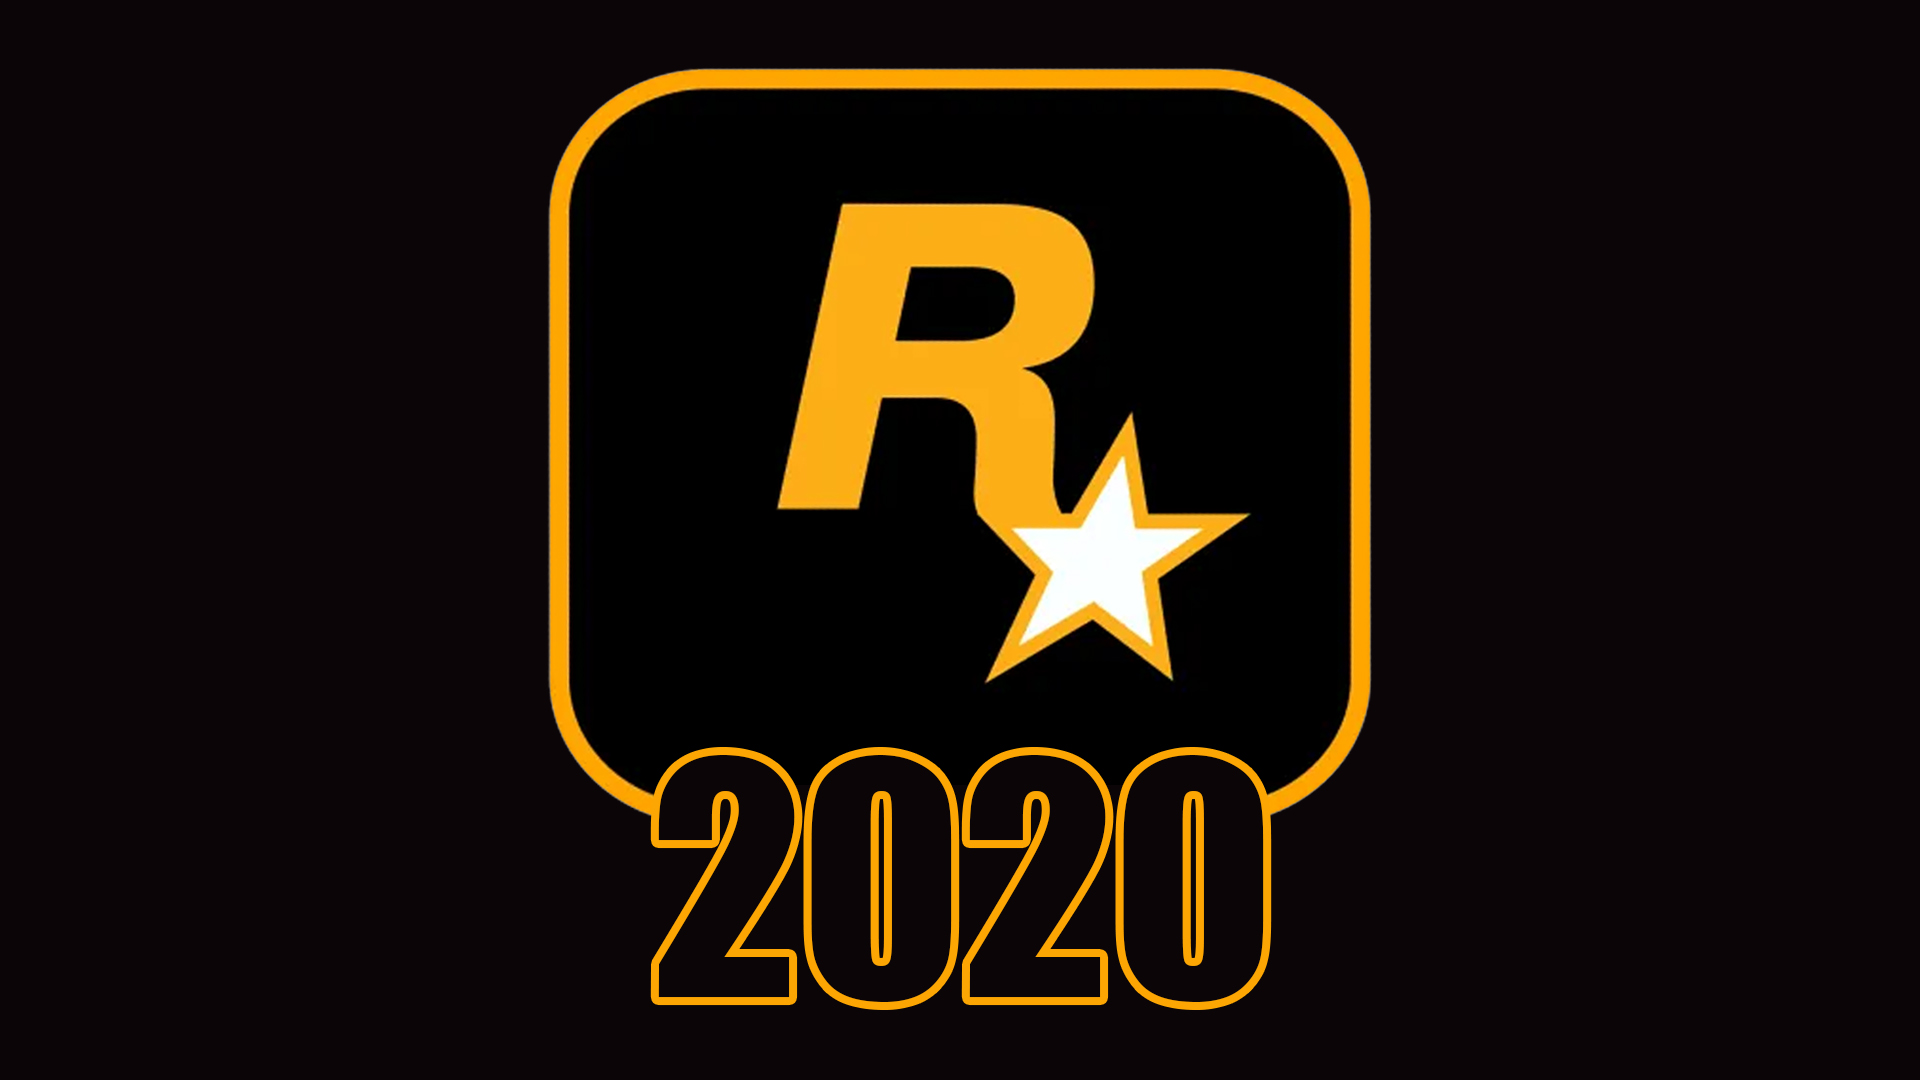 Prédiction Rockstar Games 2020